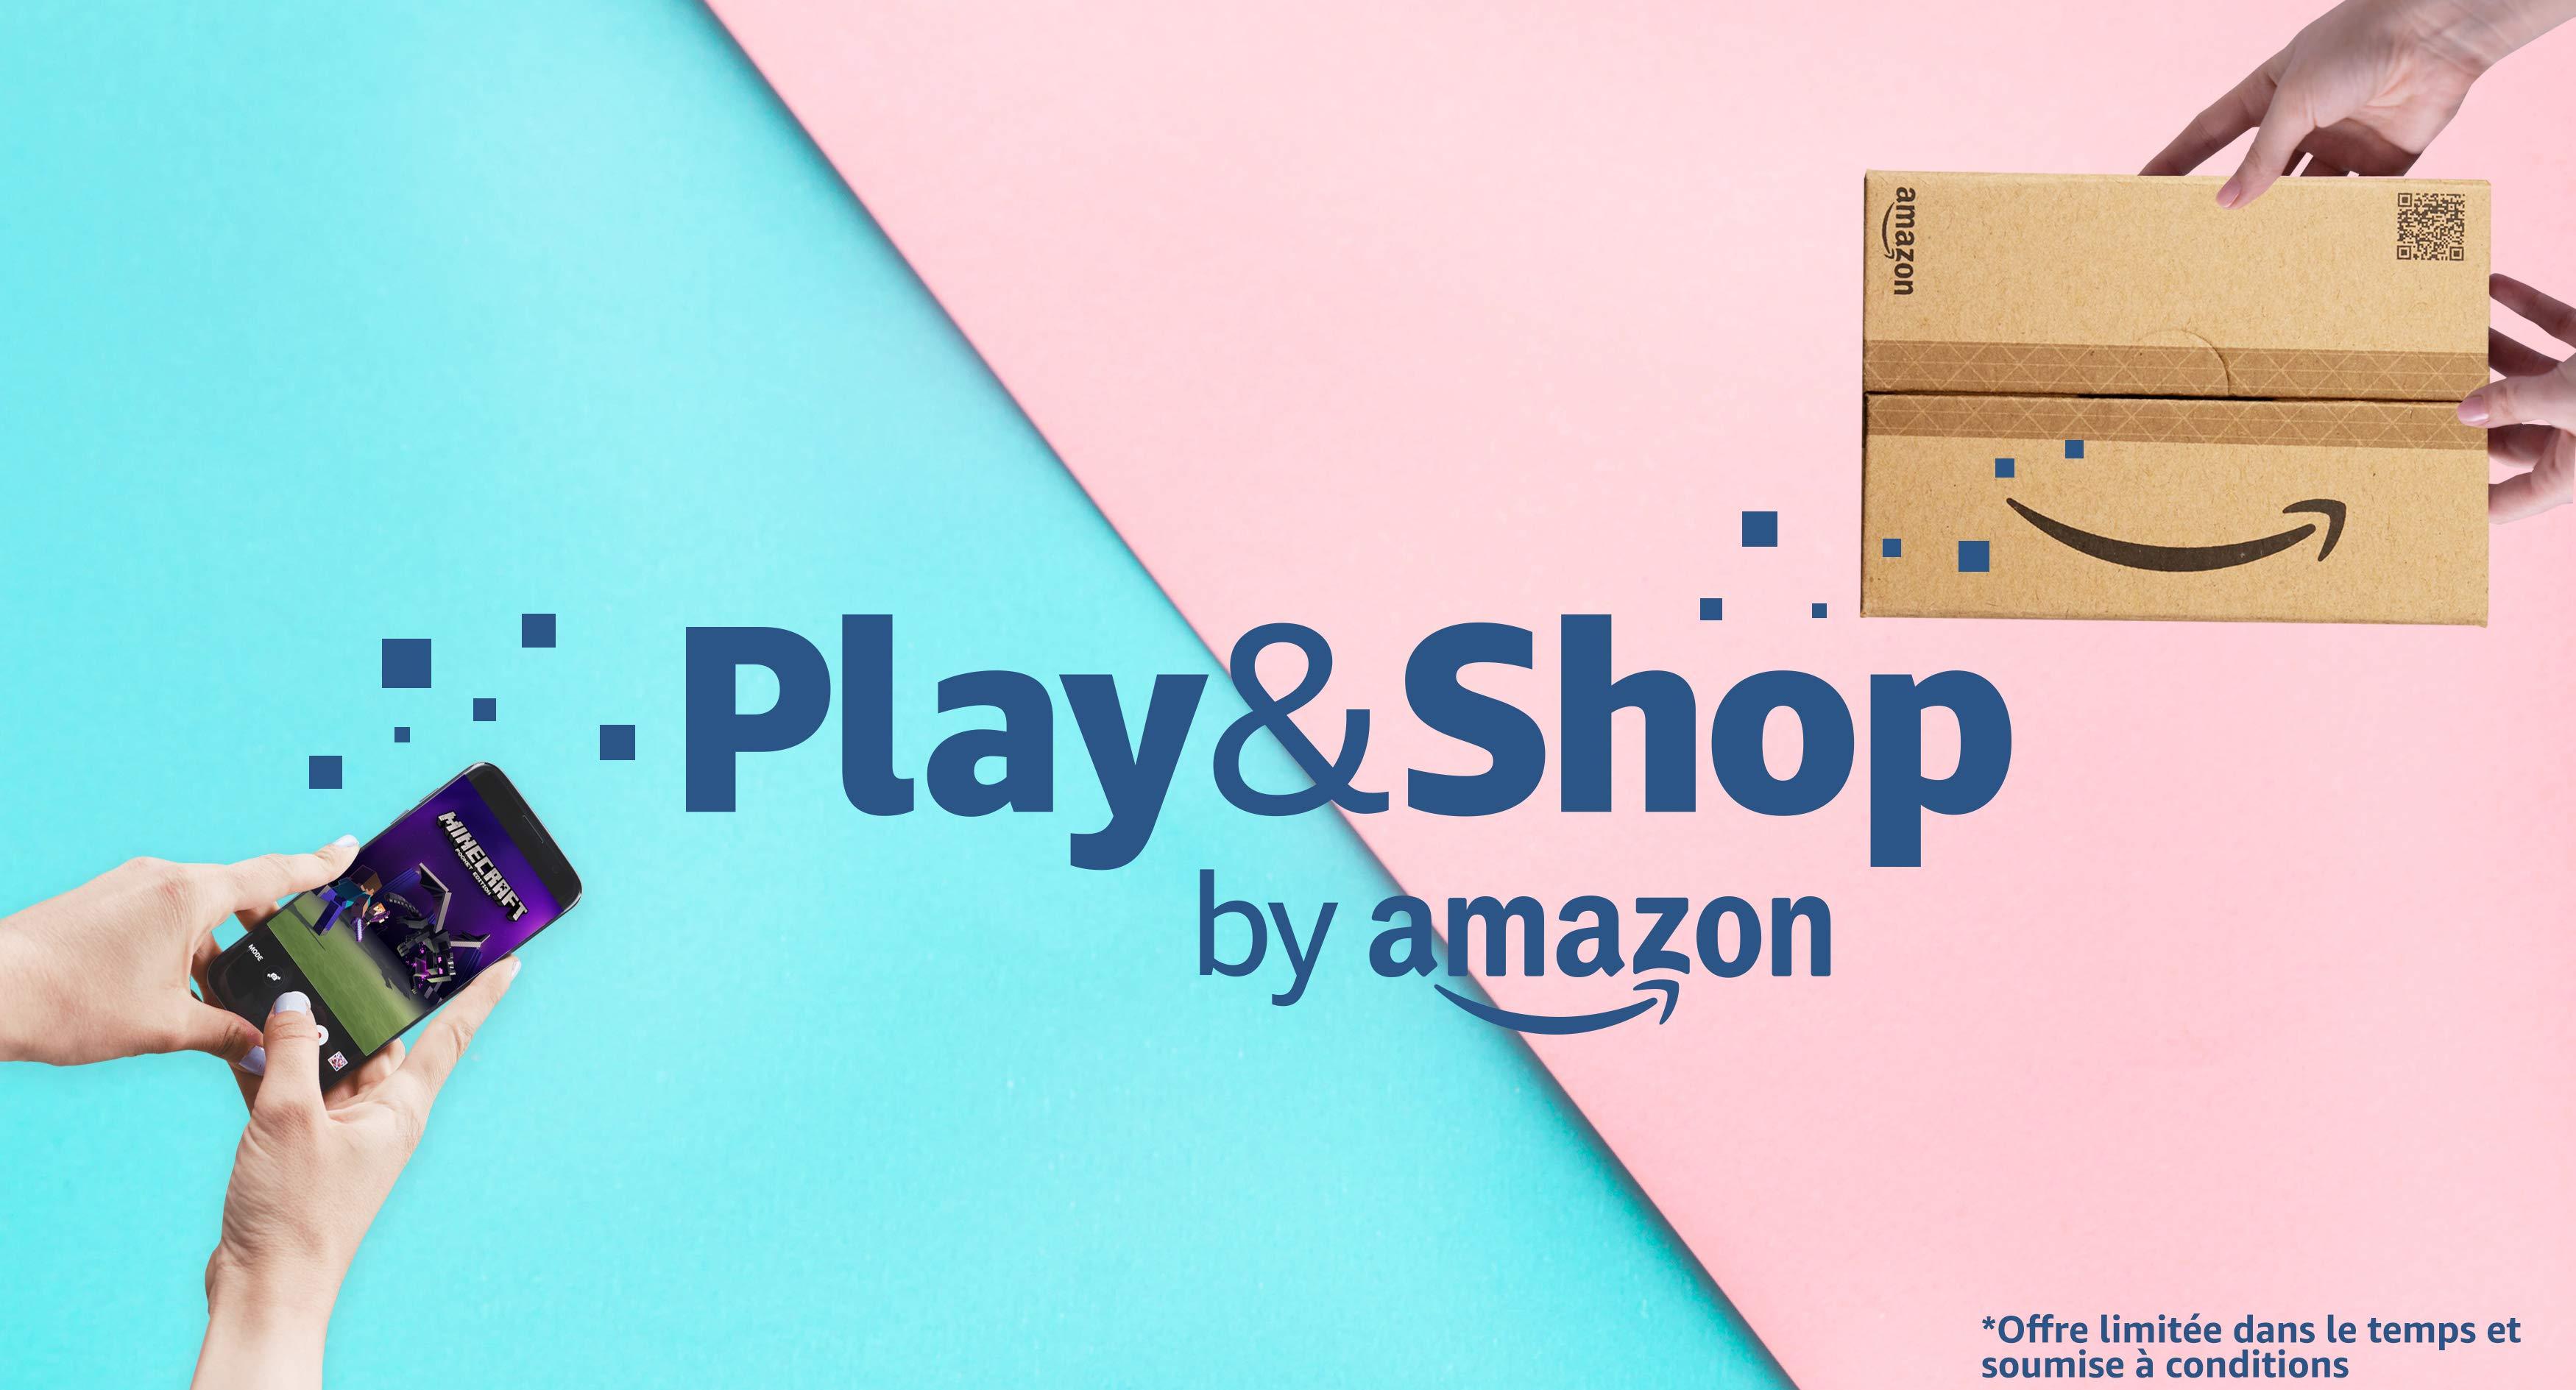 Play&Shop 10% Amazon Credit Back